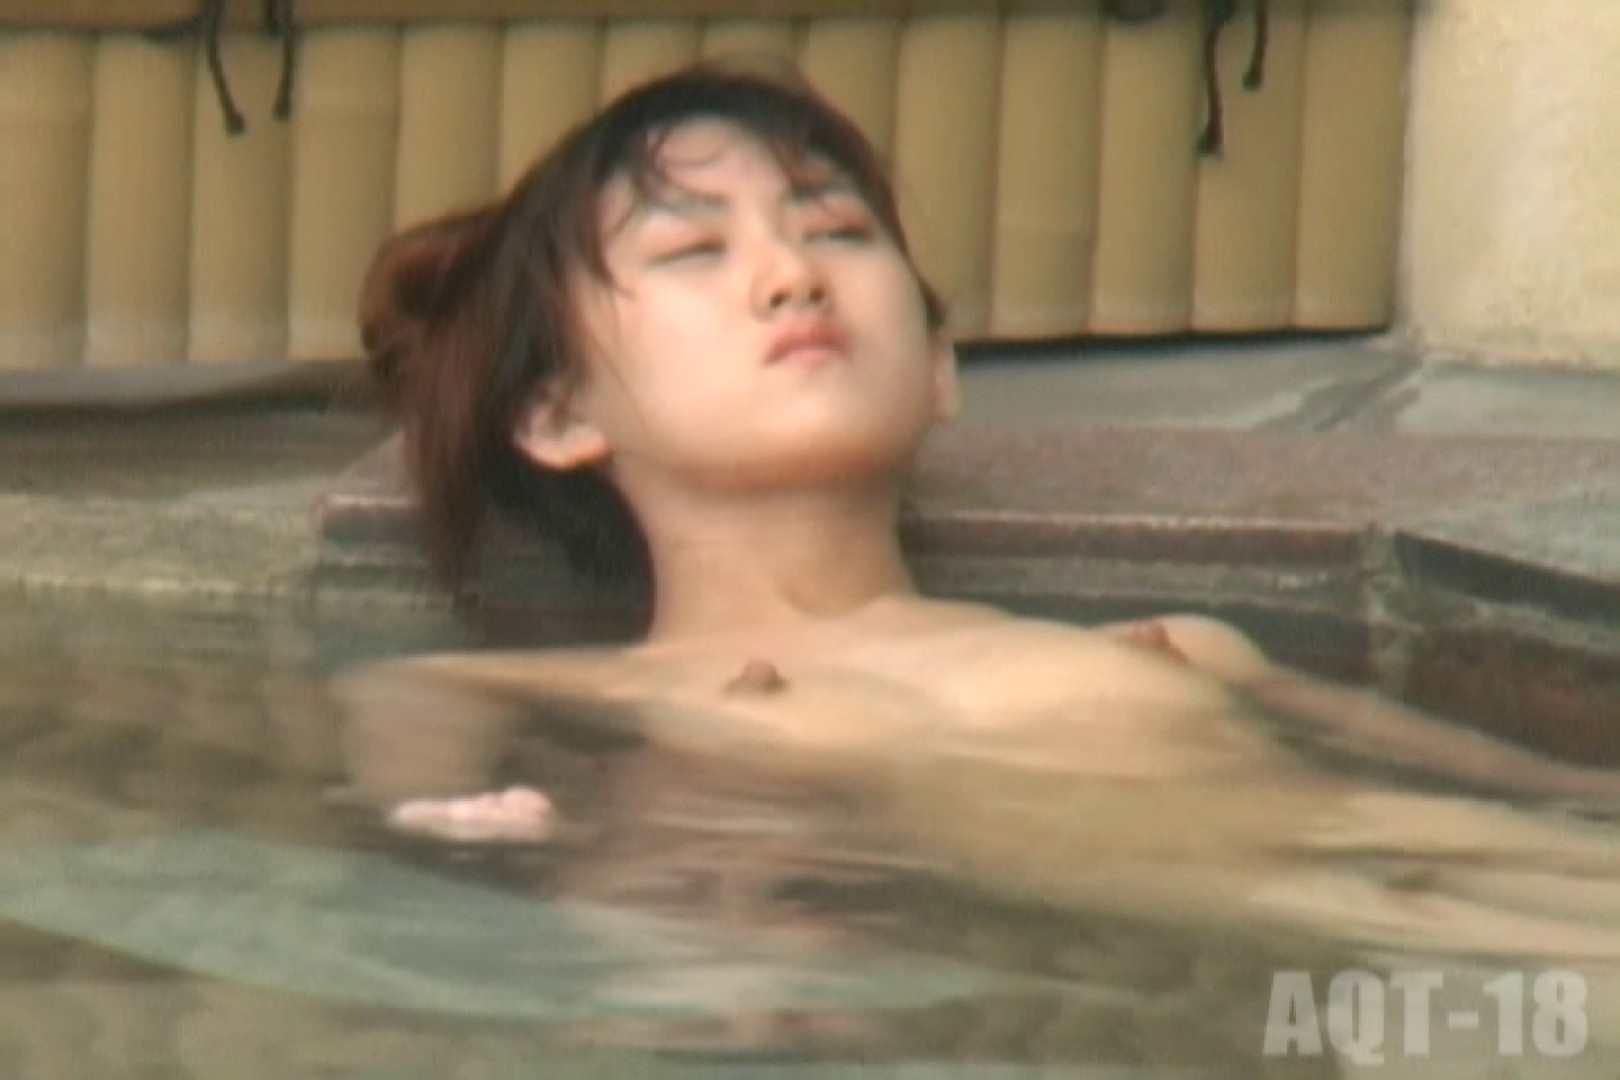 Aquaな露天風呂Vol.862 盗撮 AV無料動画キャプチャ 92PICs 29